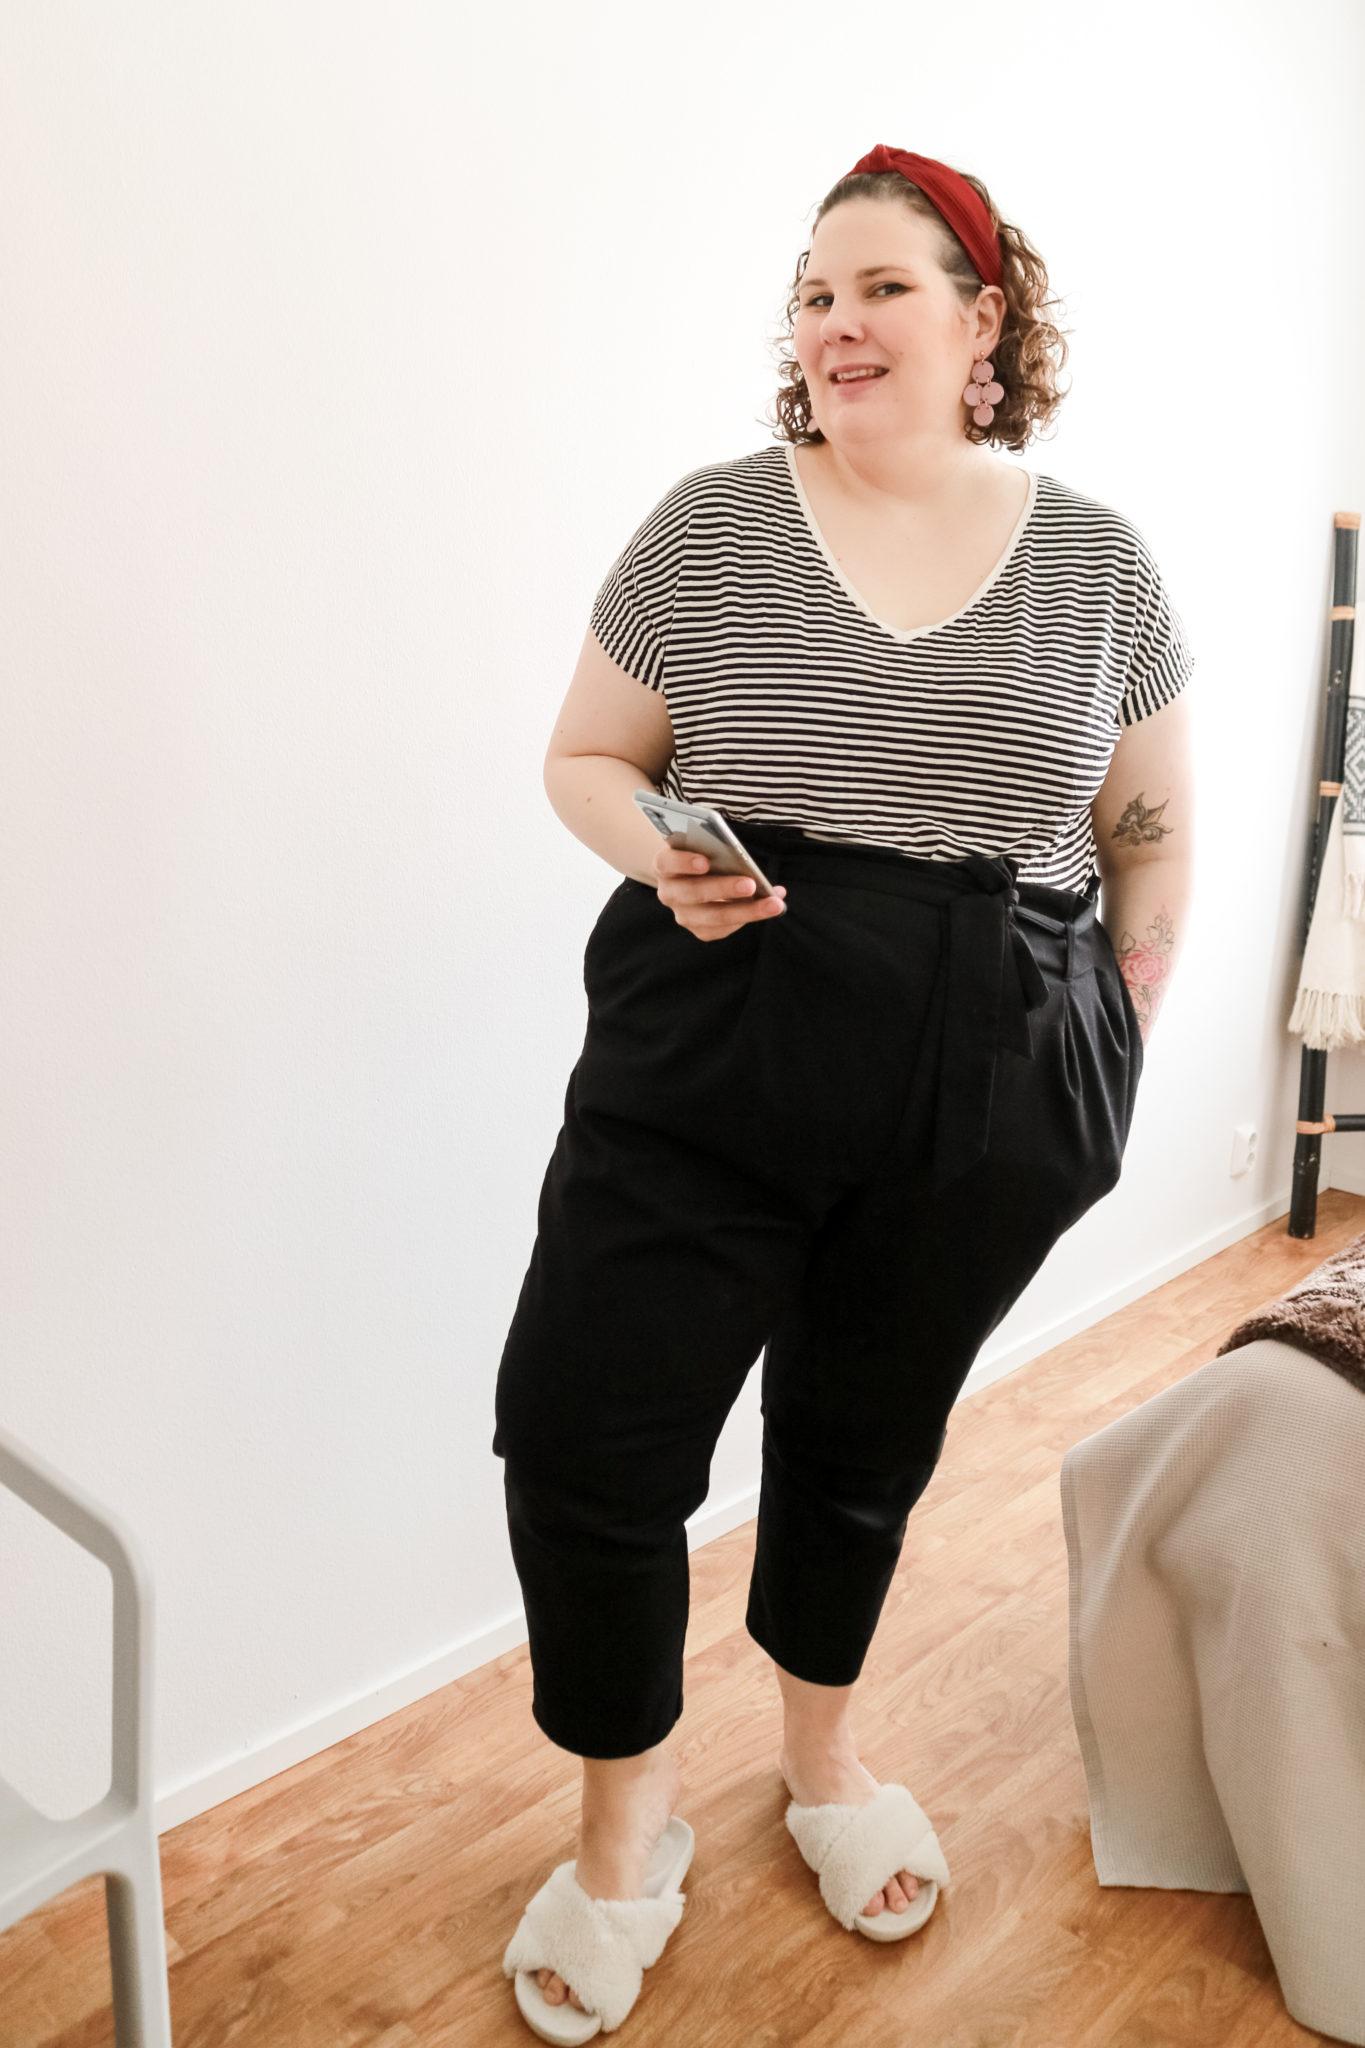 Yhdet housut viisi asua - Big mamas home by Jenni